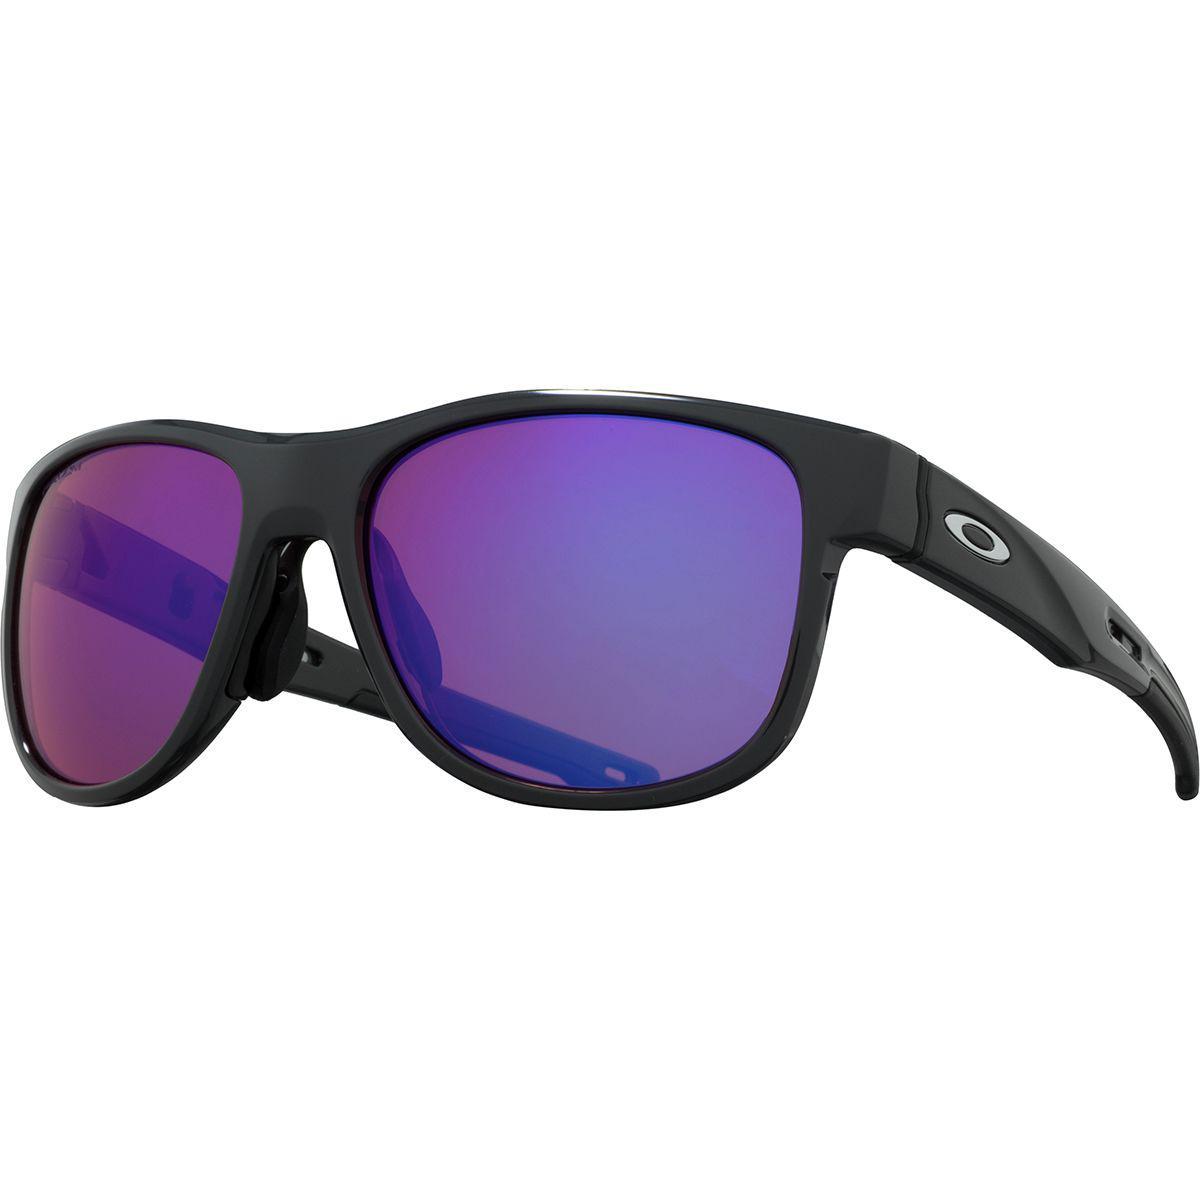 74acde76c5b Lyst - Oakley Crossrange R Asian Fit Prizm Sunglasses in Purple for Men